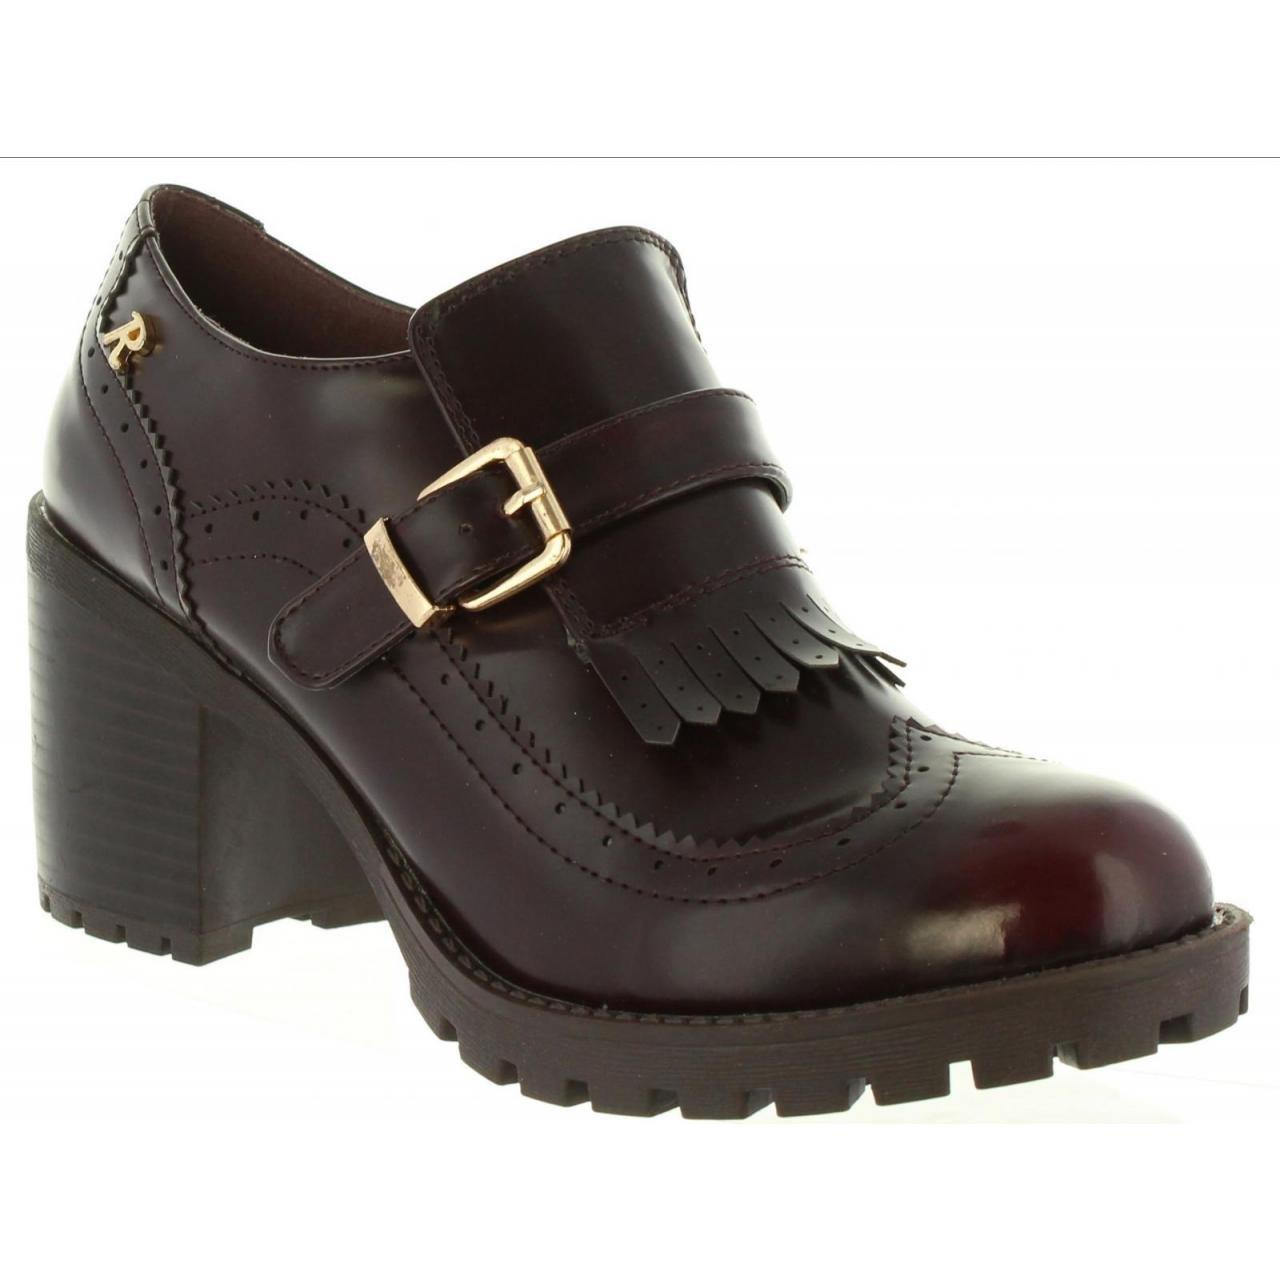 Refresh Refresh Refresh Schuhe Ferse für Damen 64008 C Burdeos 25e85e